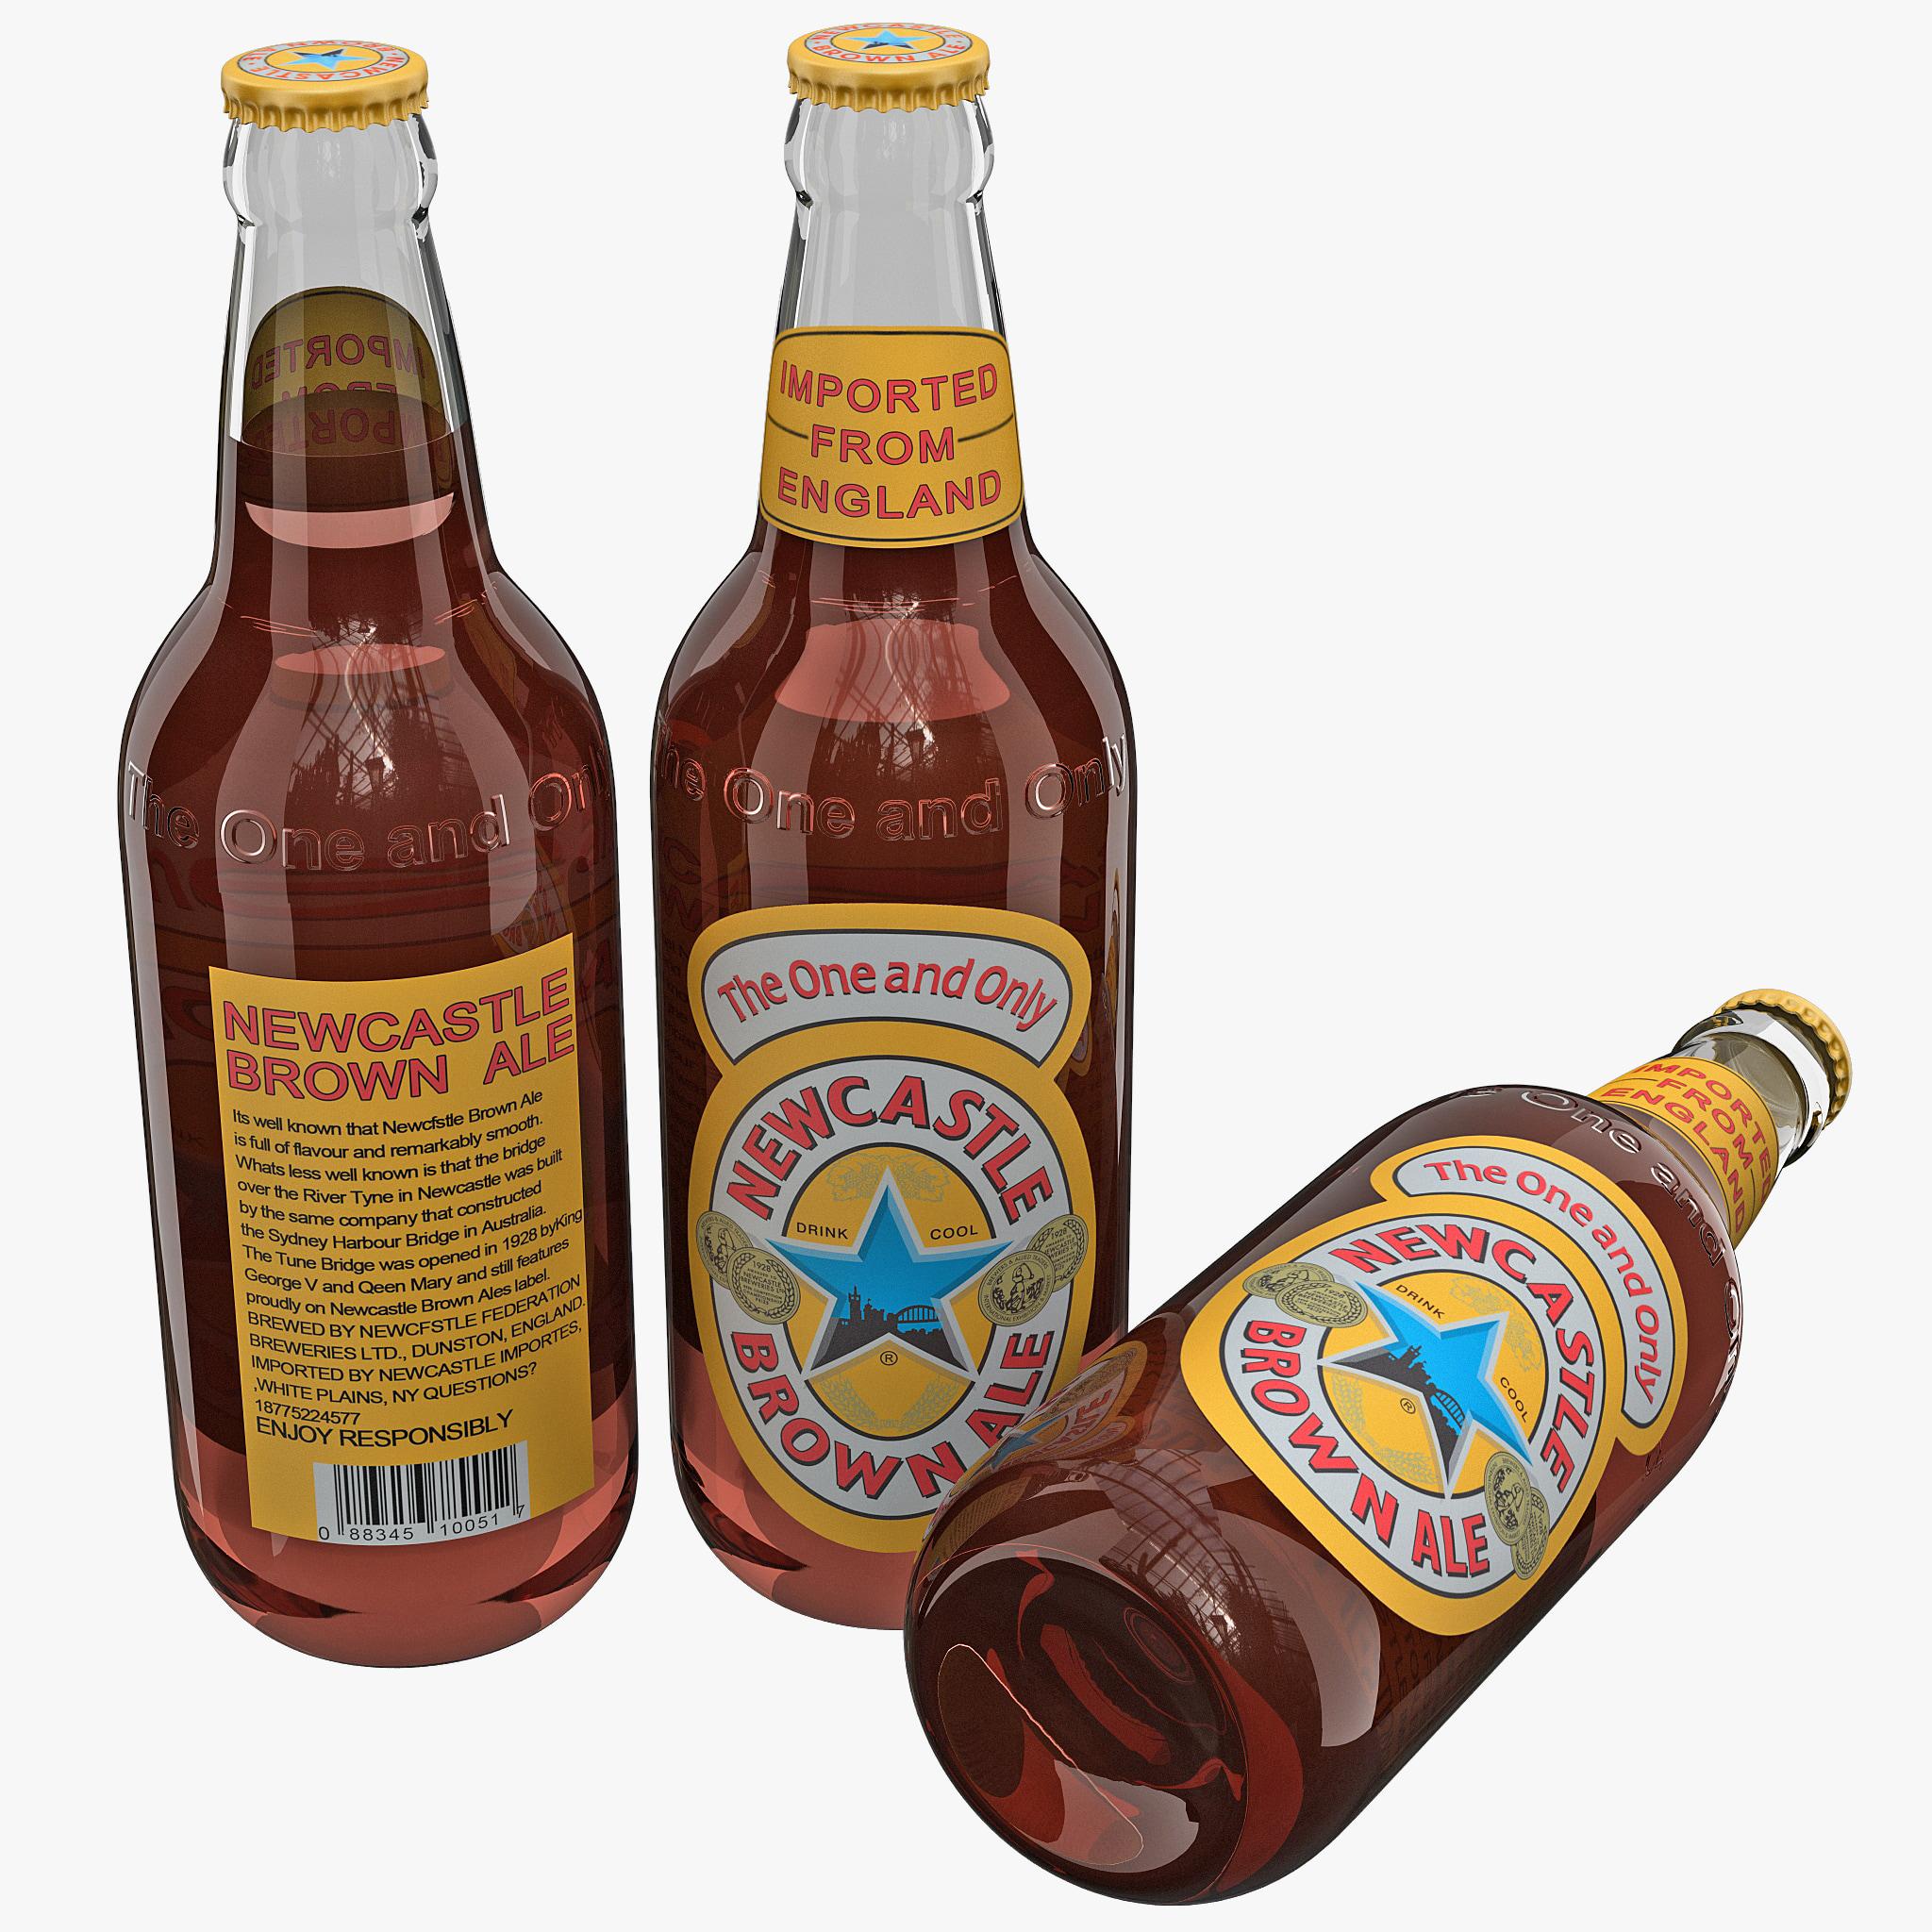 New Castle Brown Ale Beer Bottle_1.jpg